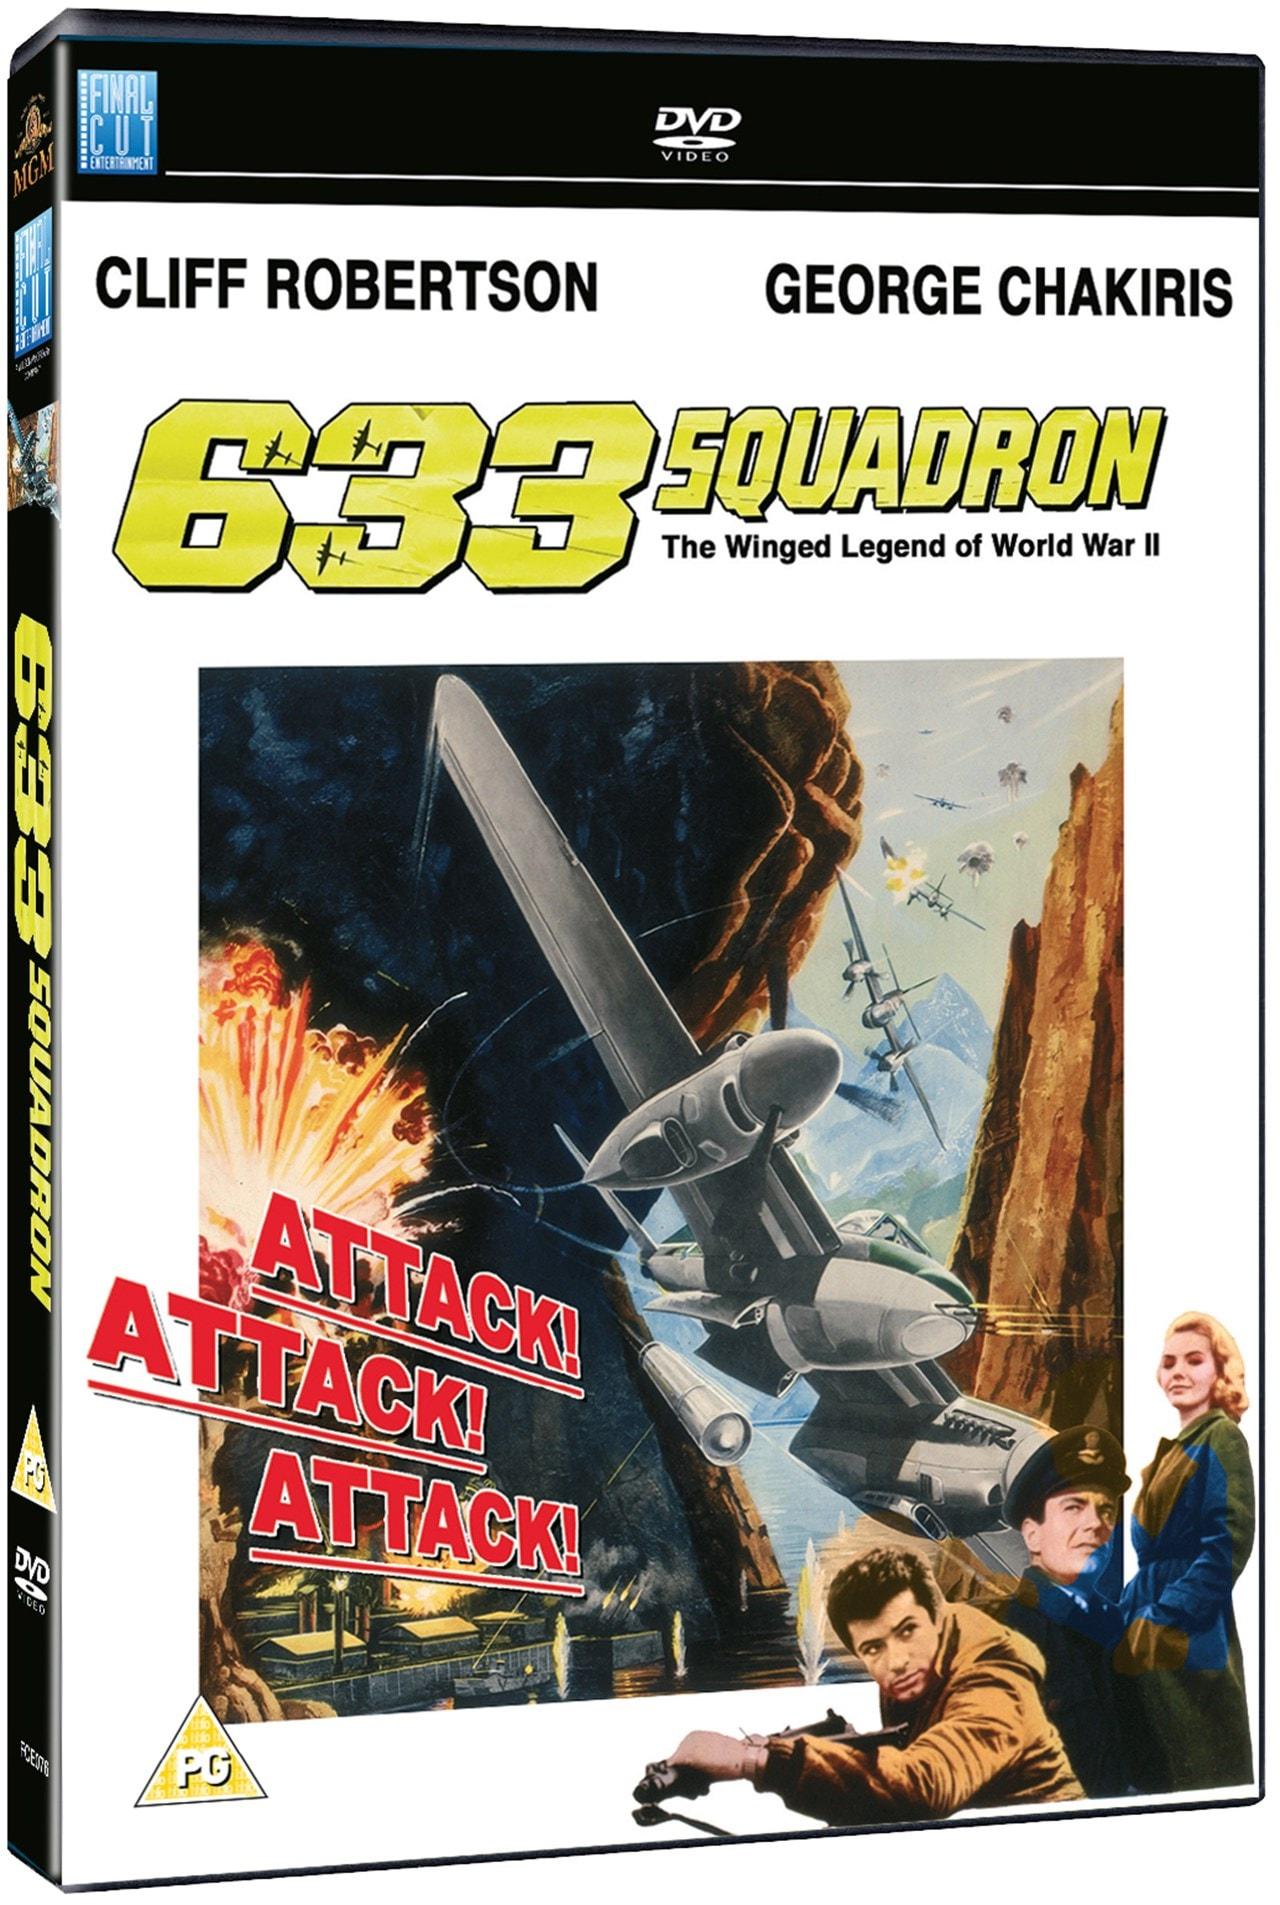 633 squadron - 1